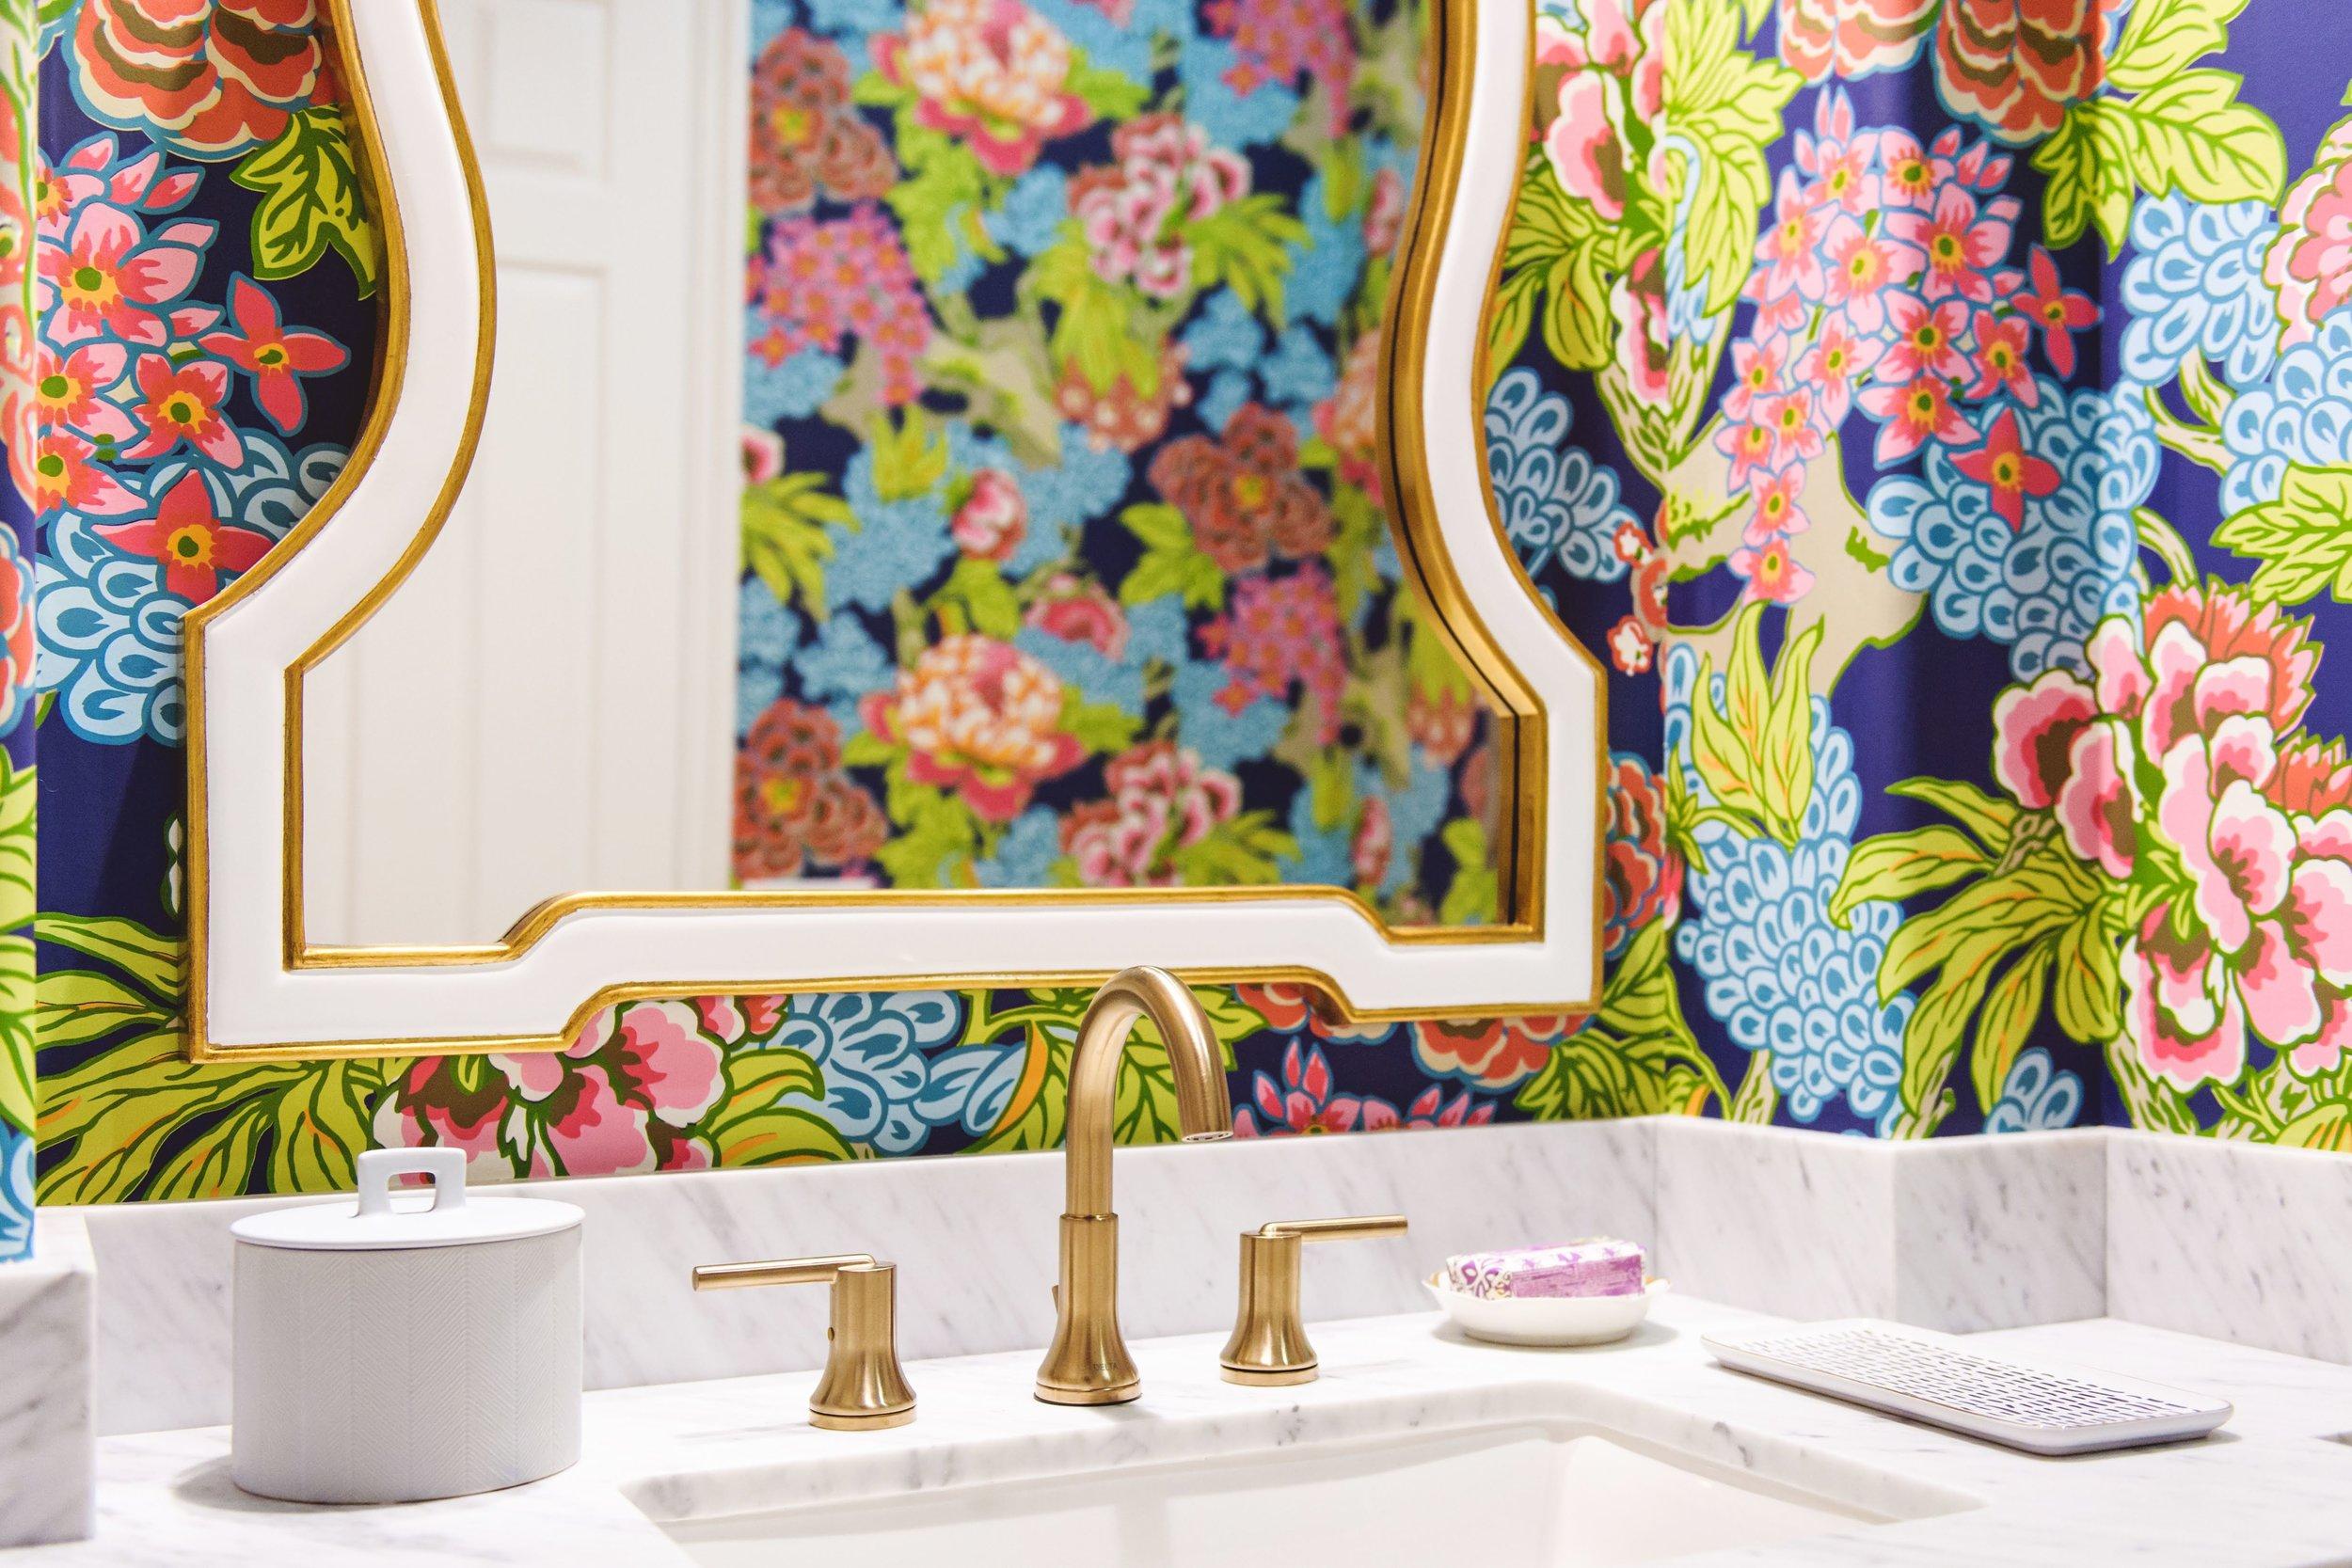 savvy {holly leaf} hall bathroom-0011 2.jpg